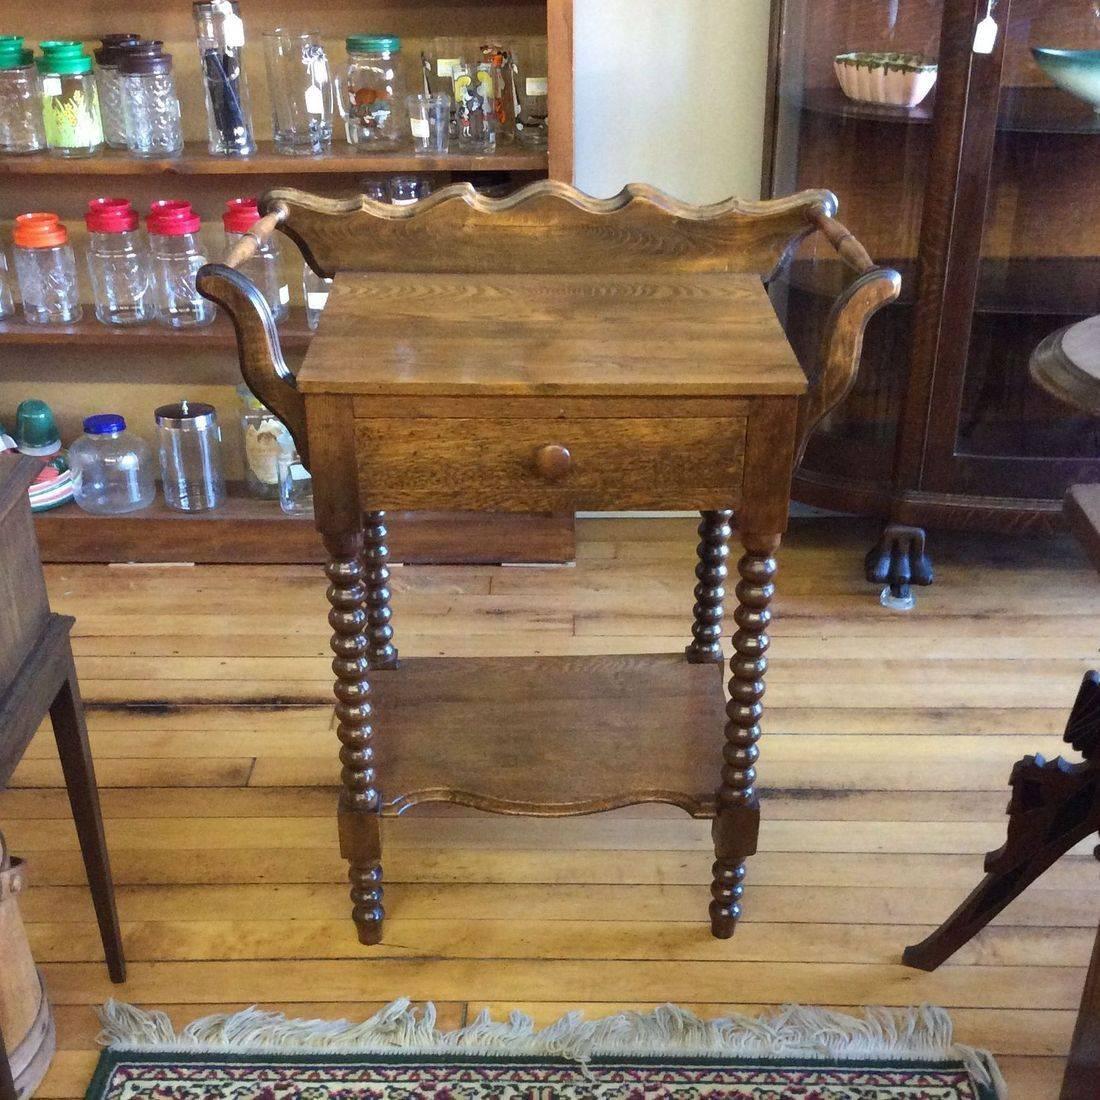 Late 1800's Jenny Lind Oak 1-Drawer Washstand w/Shelf and Towel Bars   $175.00